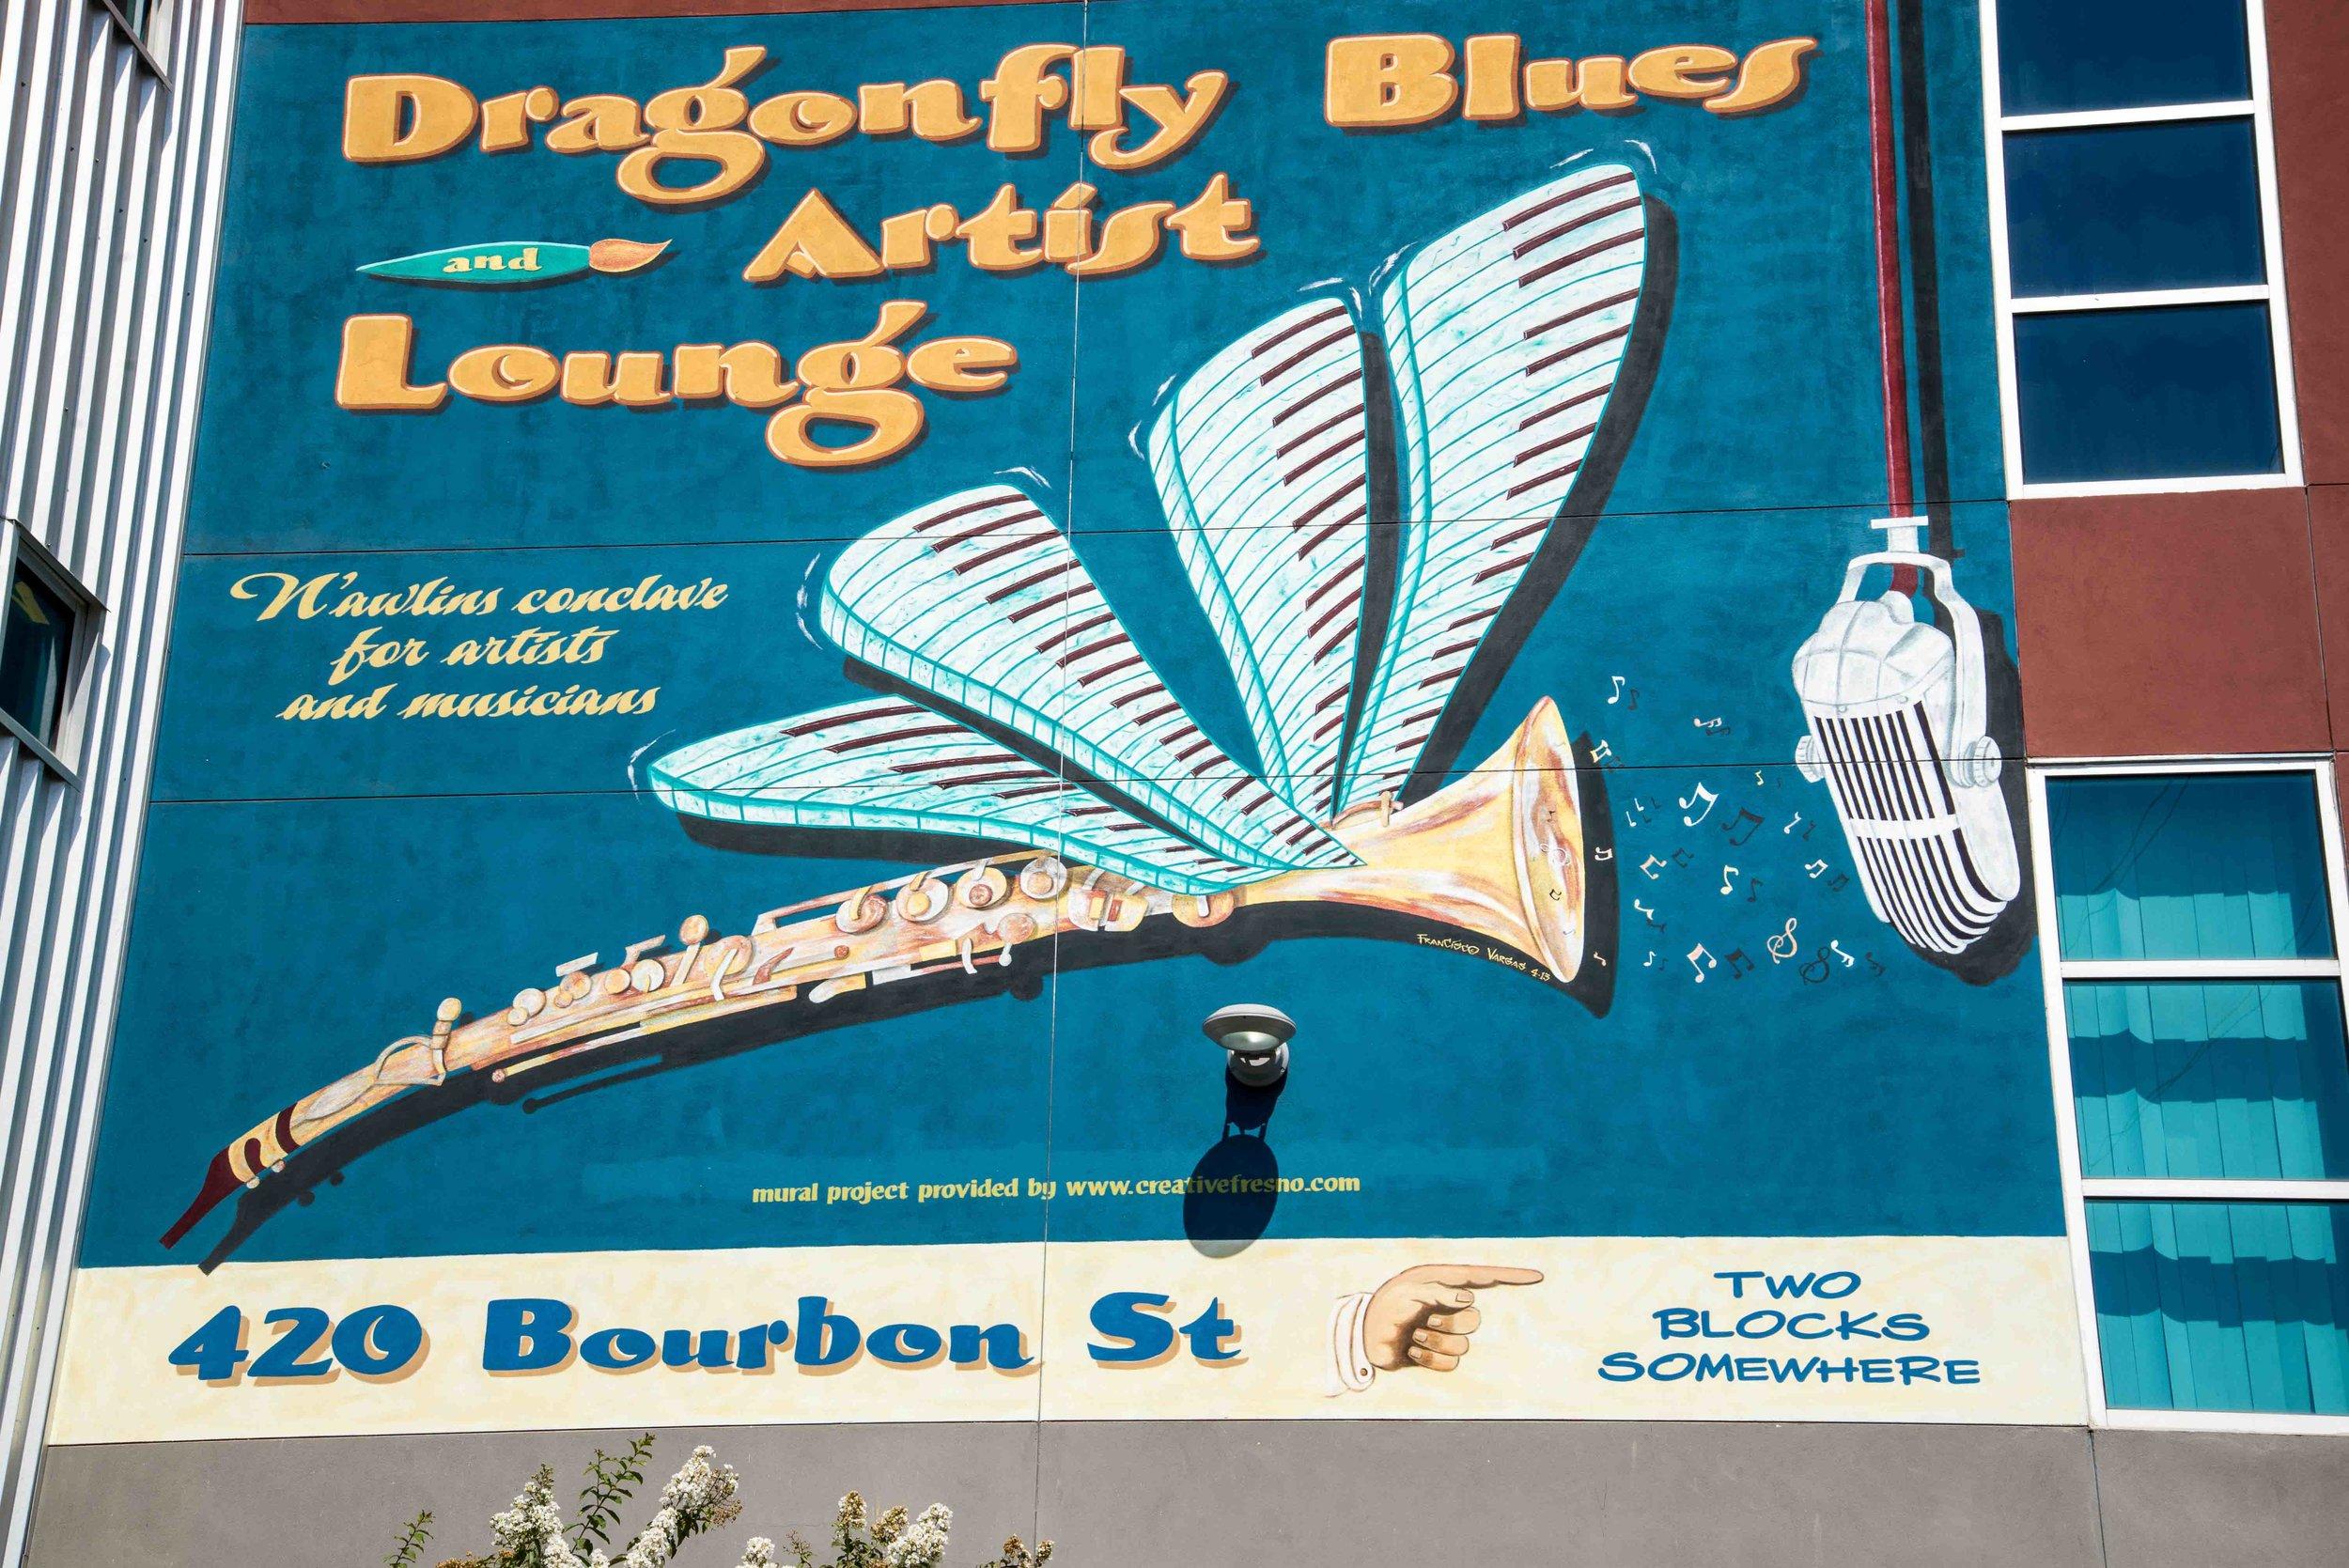 Iron Bird Lofts, Dragonfly Blues, 1901 Fulton St, 93721,_.jpg